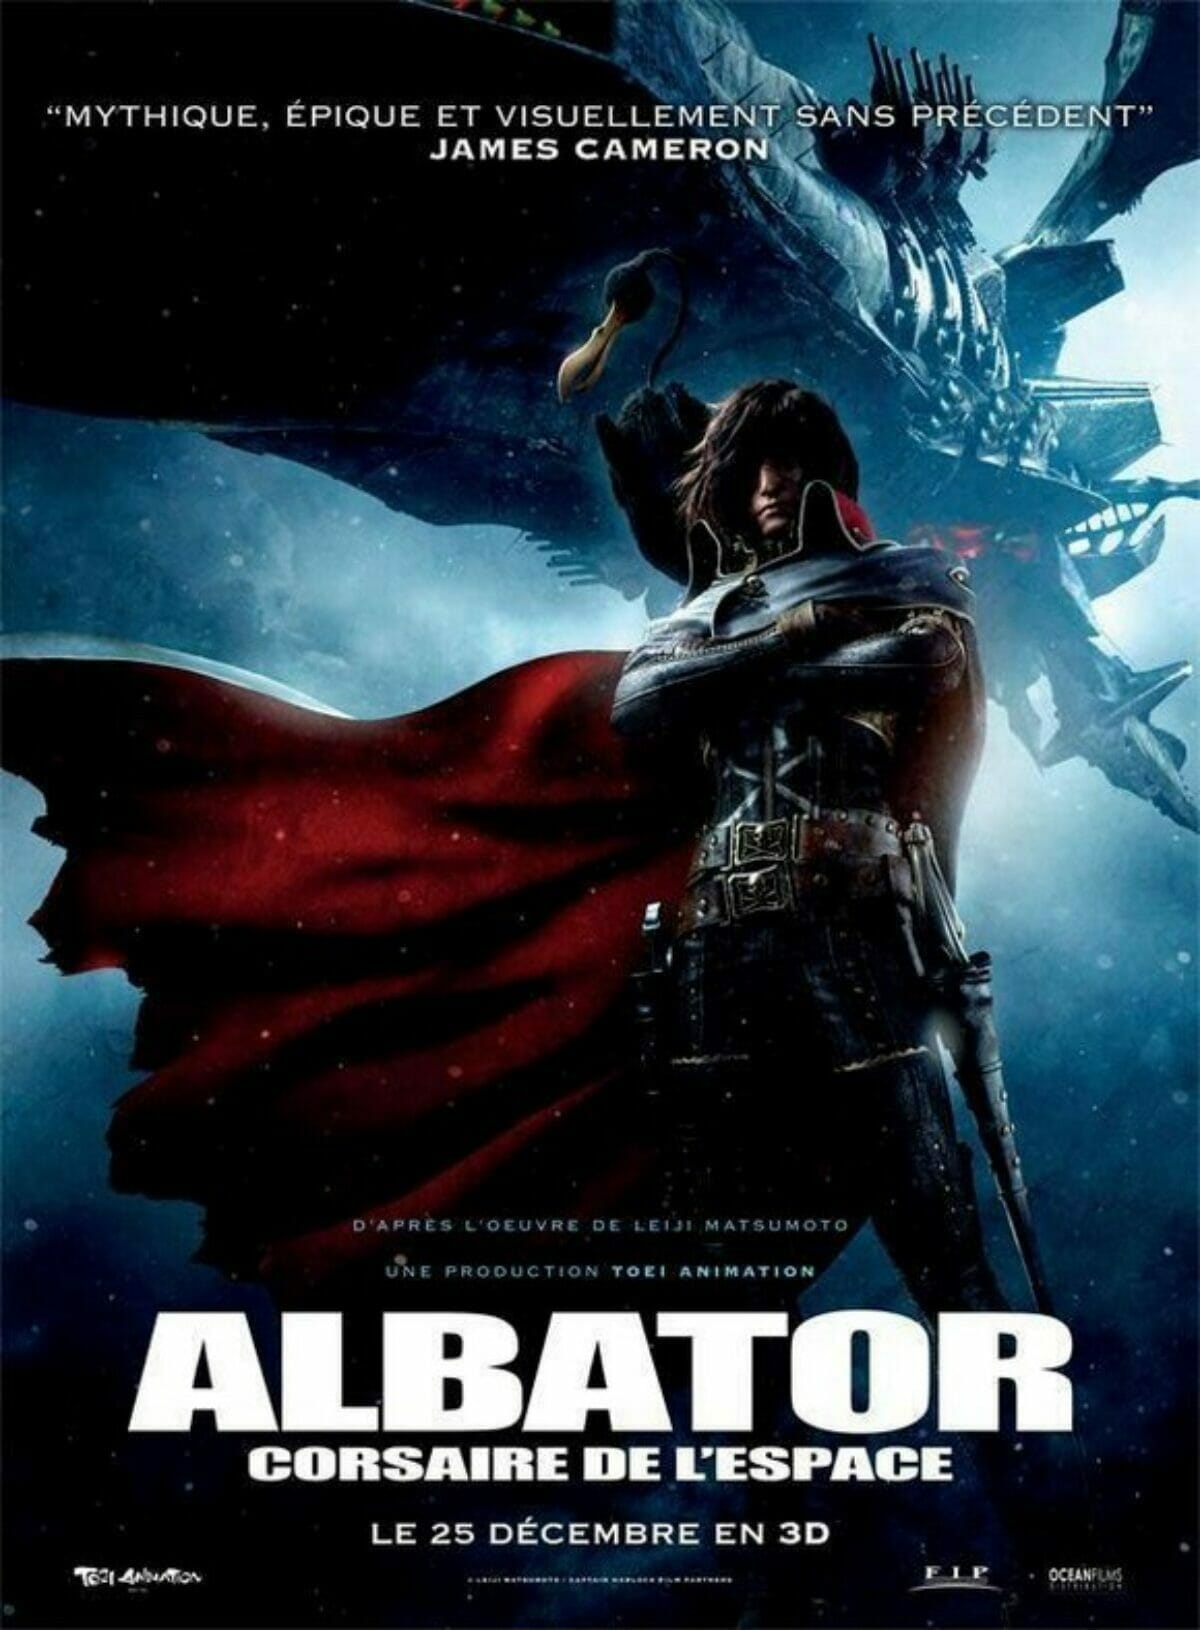 albator-affiche-france